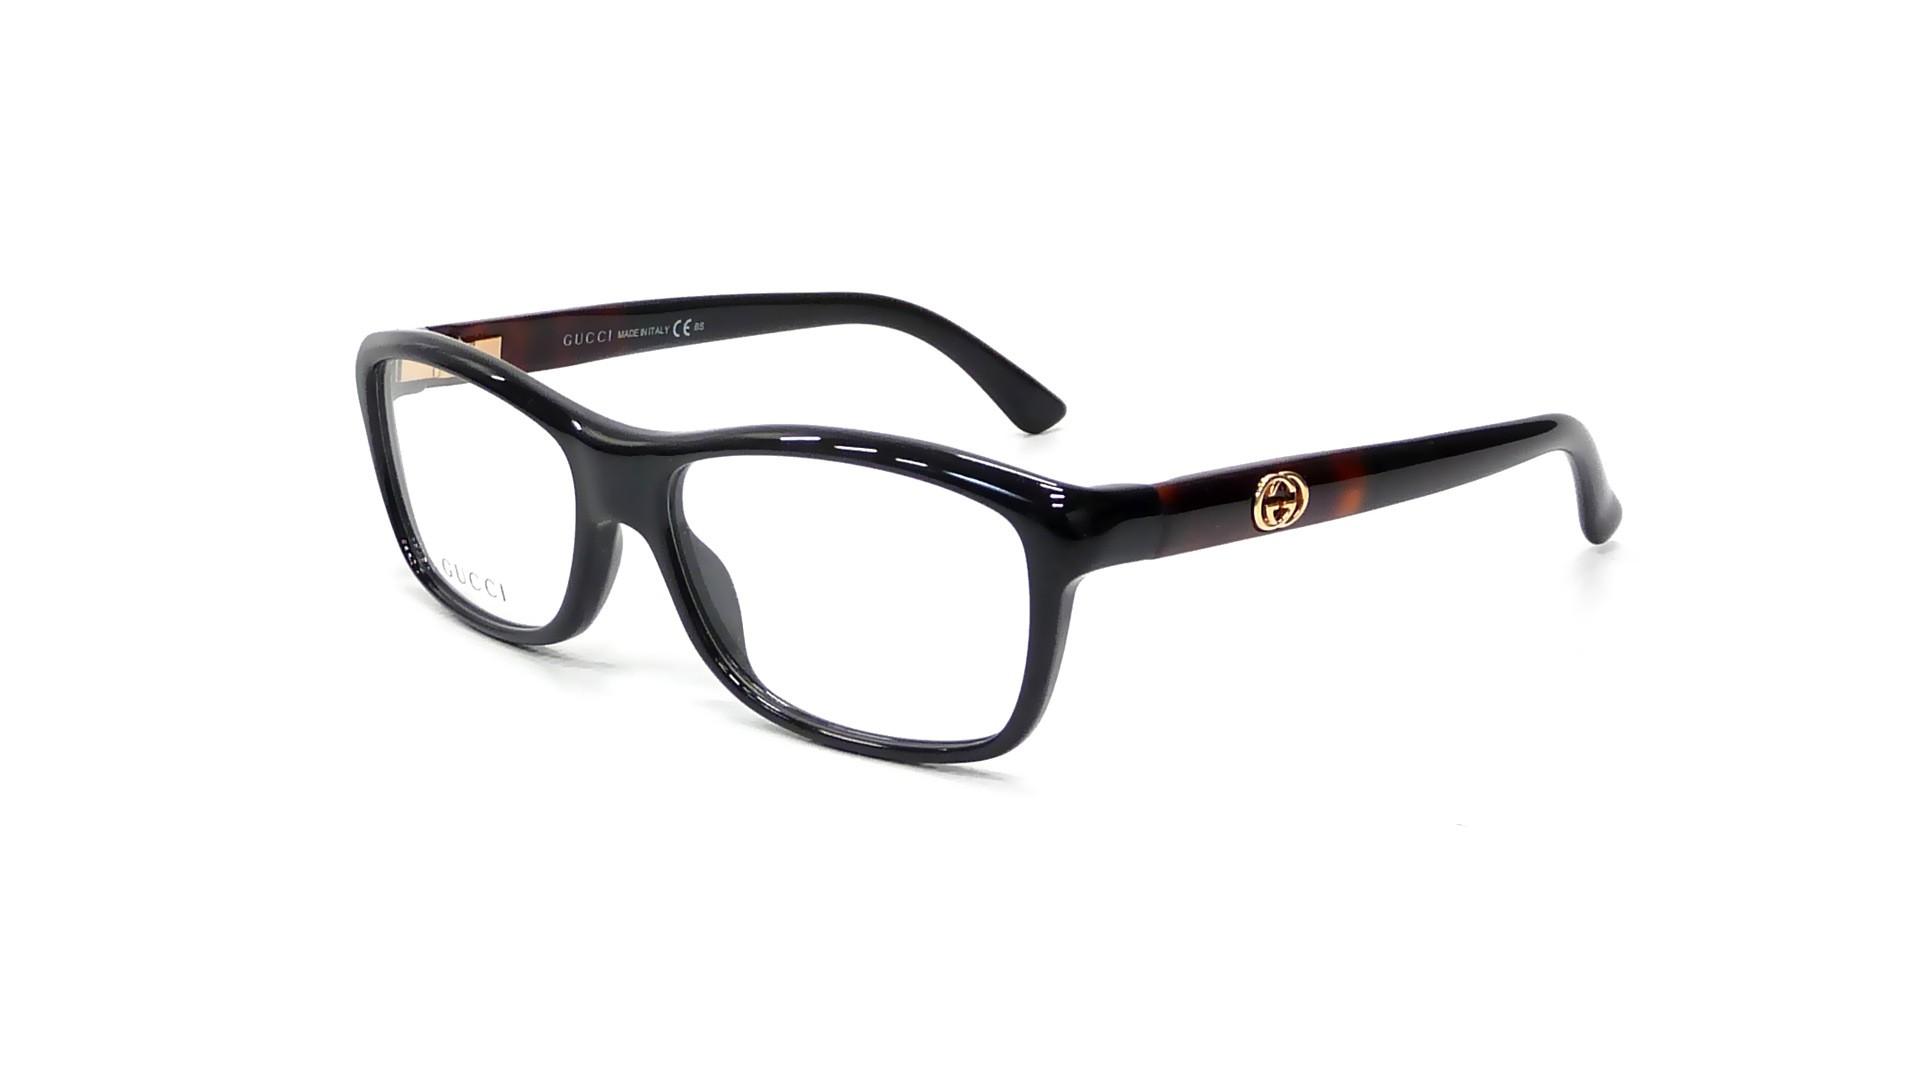 Gucci Tortoise Eyeglass Frames : Gucci GG3608 6ES 51-15 Tortoise Visiofactory